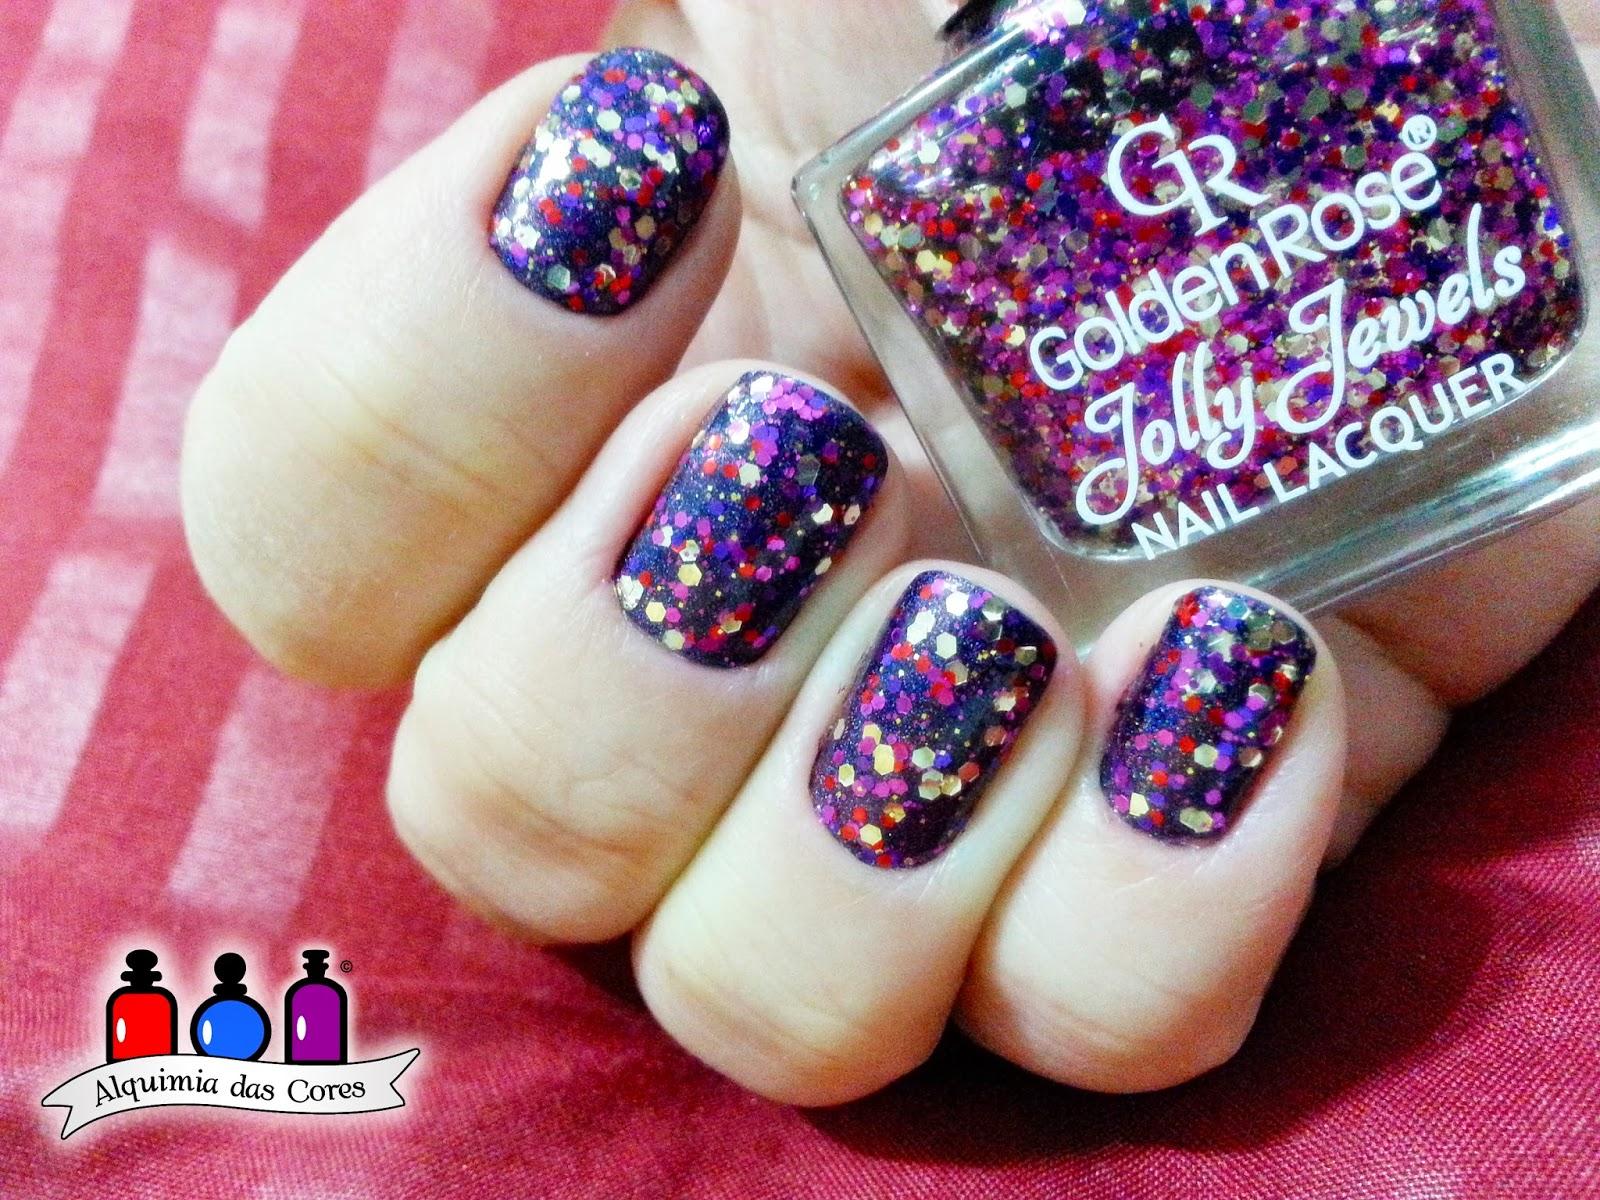 arii góes, glitter, rosa, roxo, azul, prata, golden rose 120